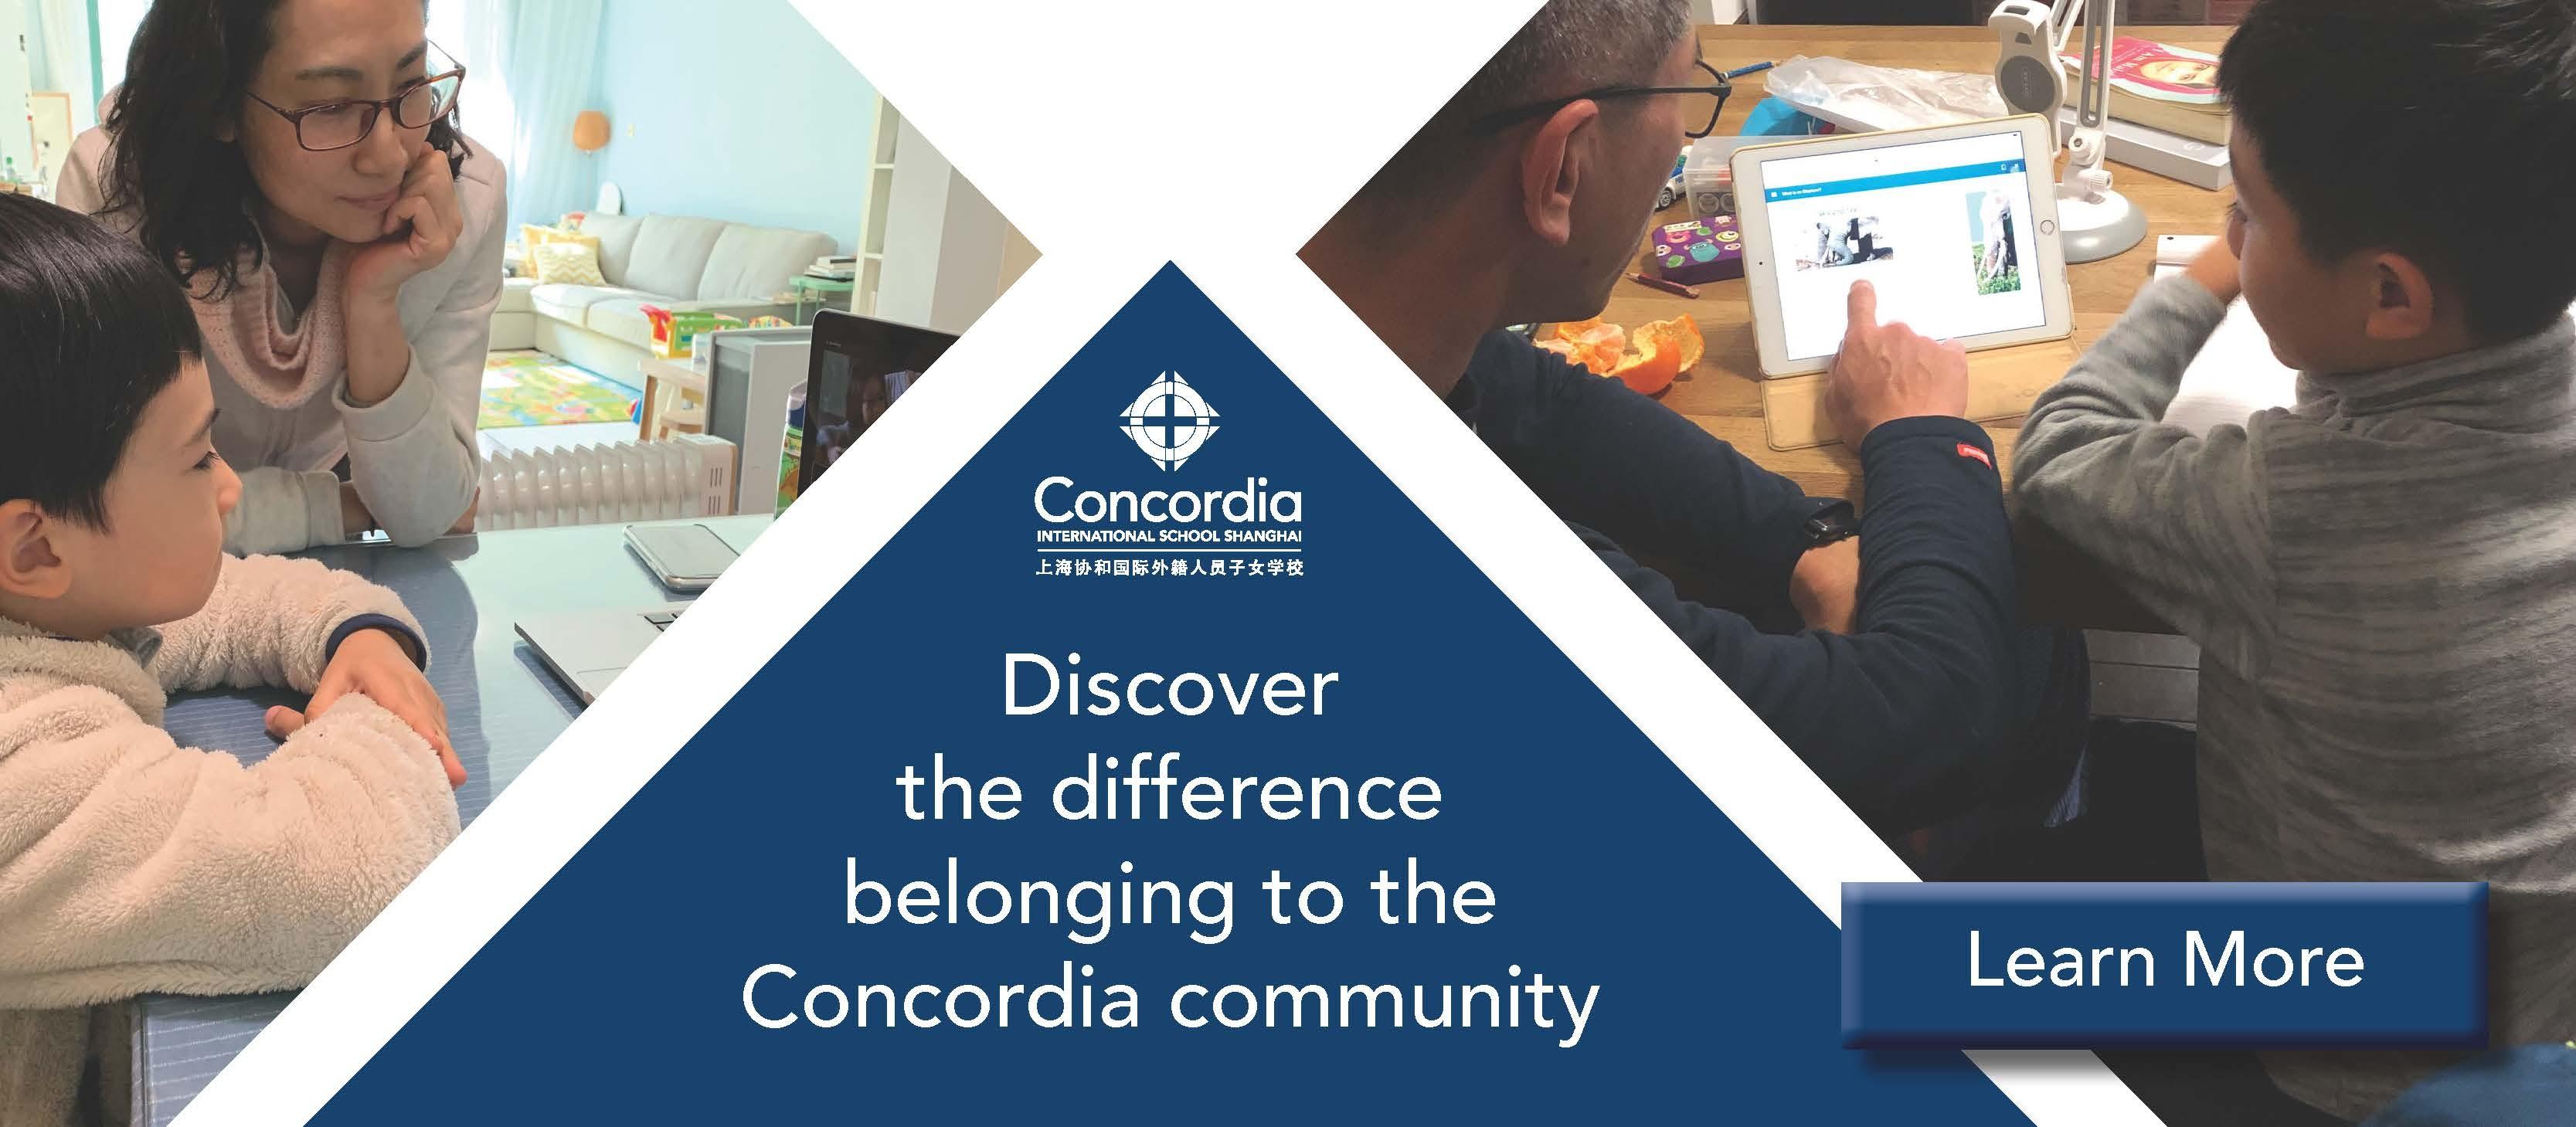 Discover the difference Concordia CTA